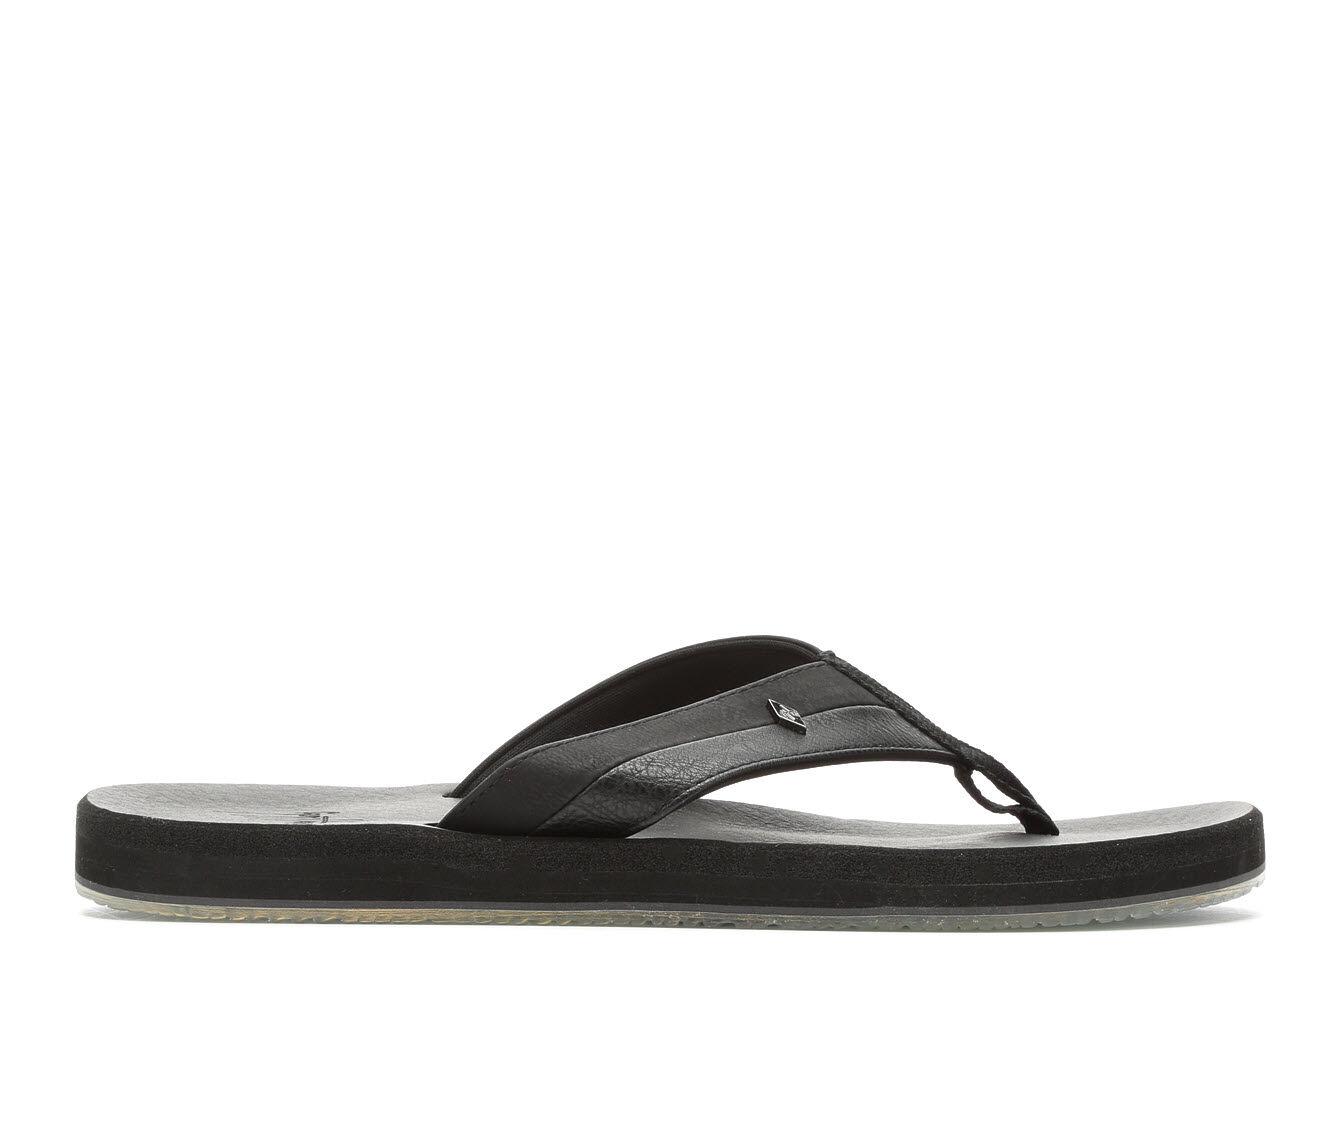 uk shoes_kd2649